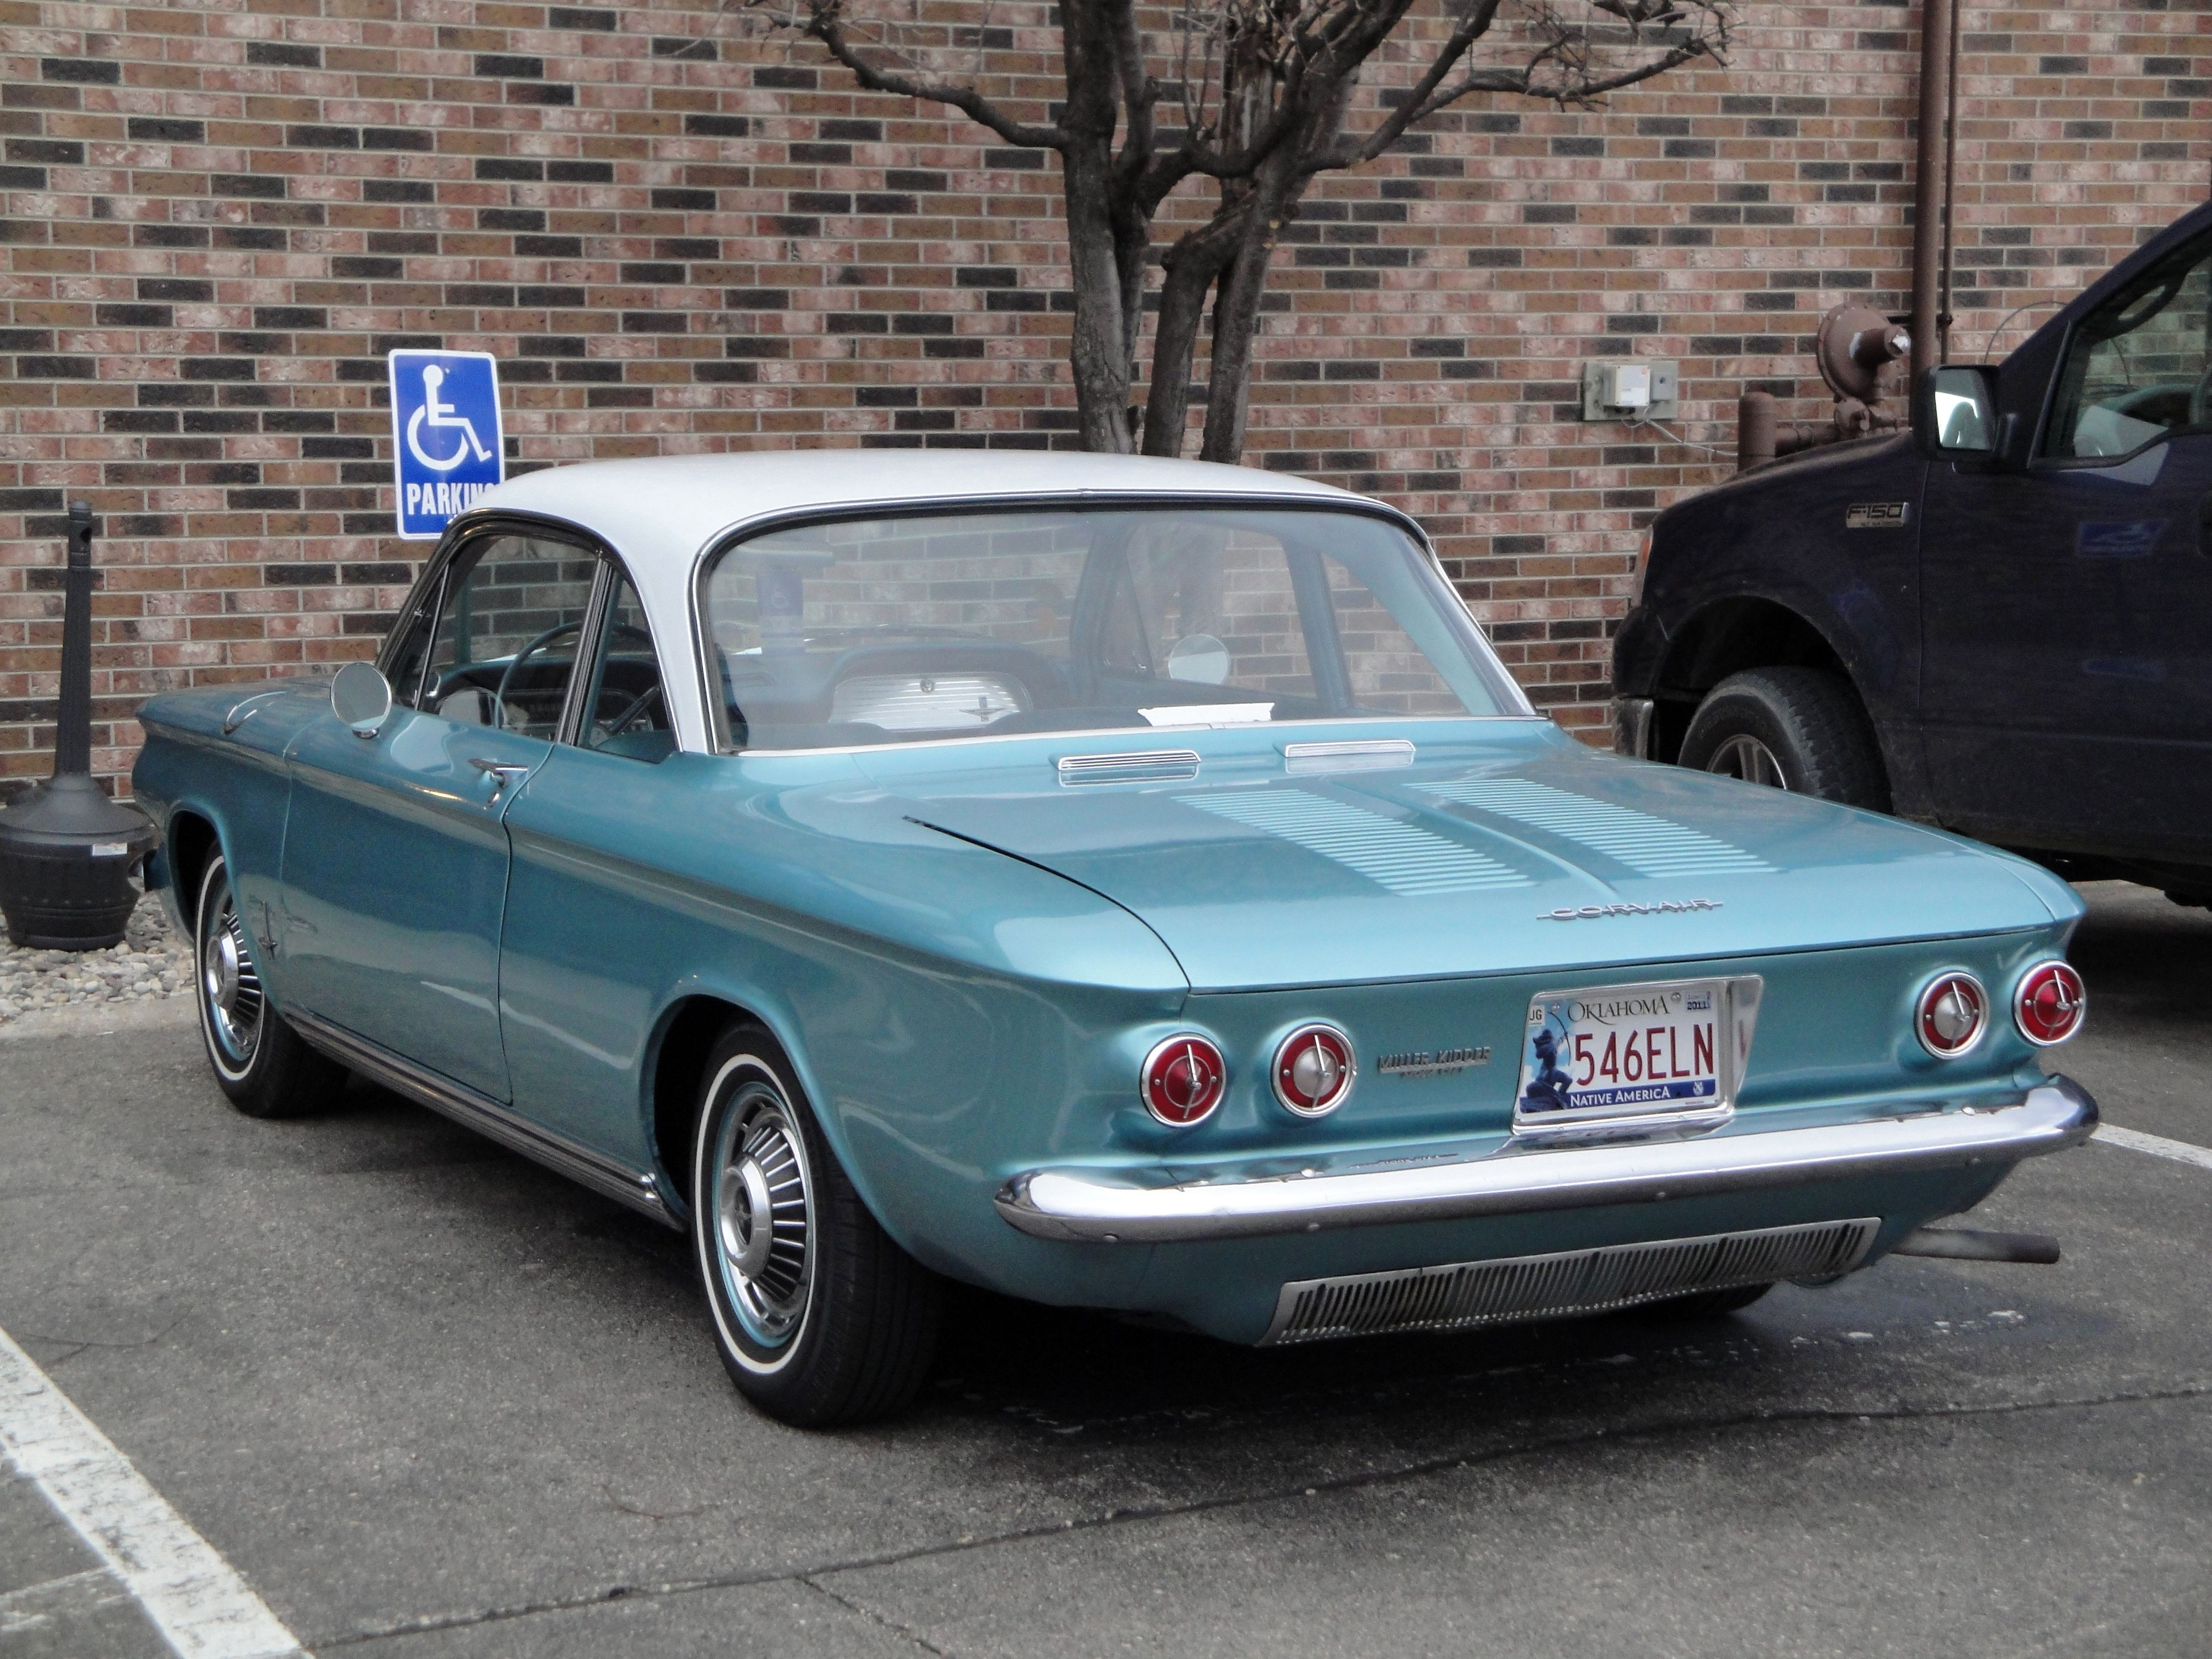 Chevrolet corvair chevrolet corvair 1959